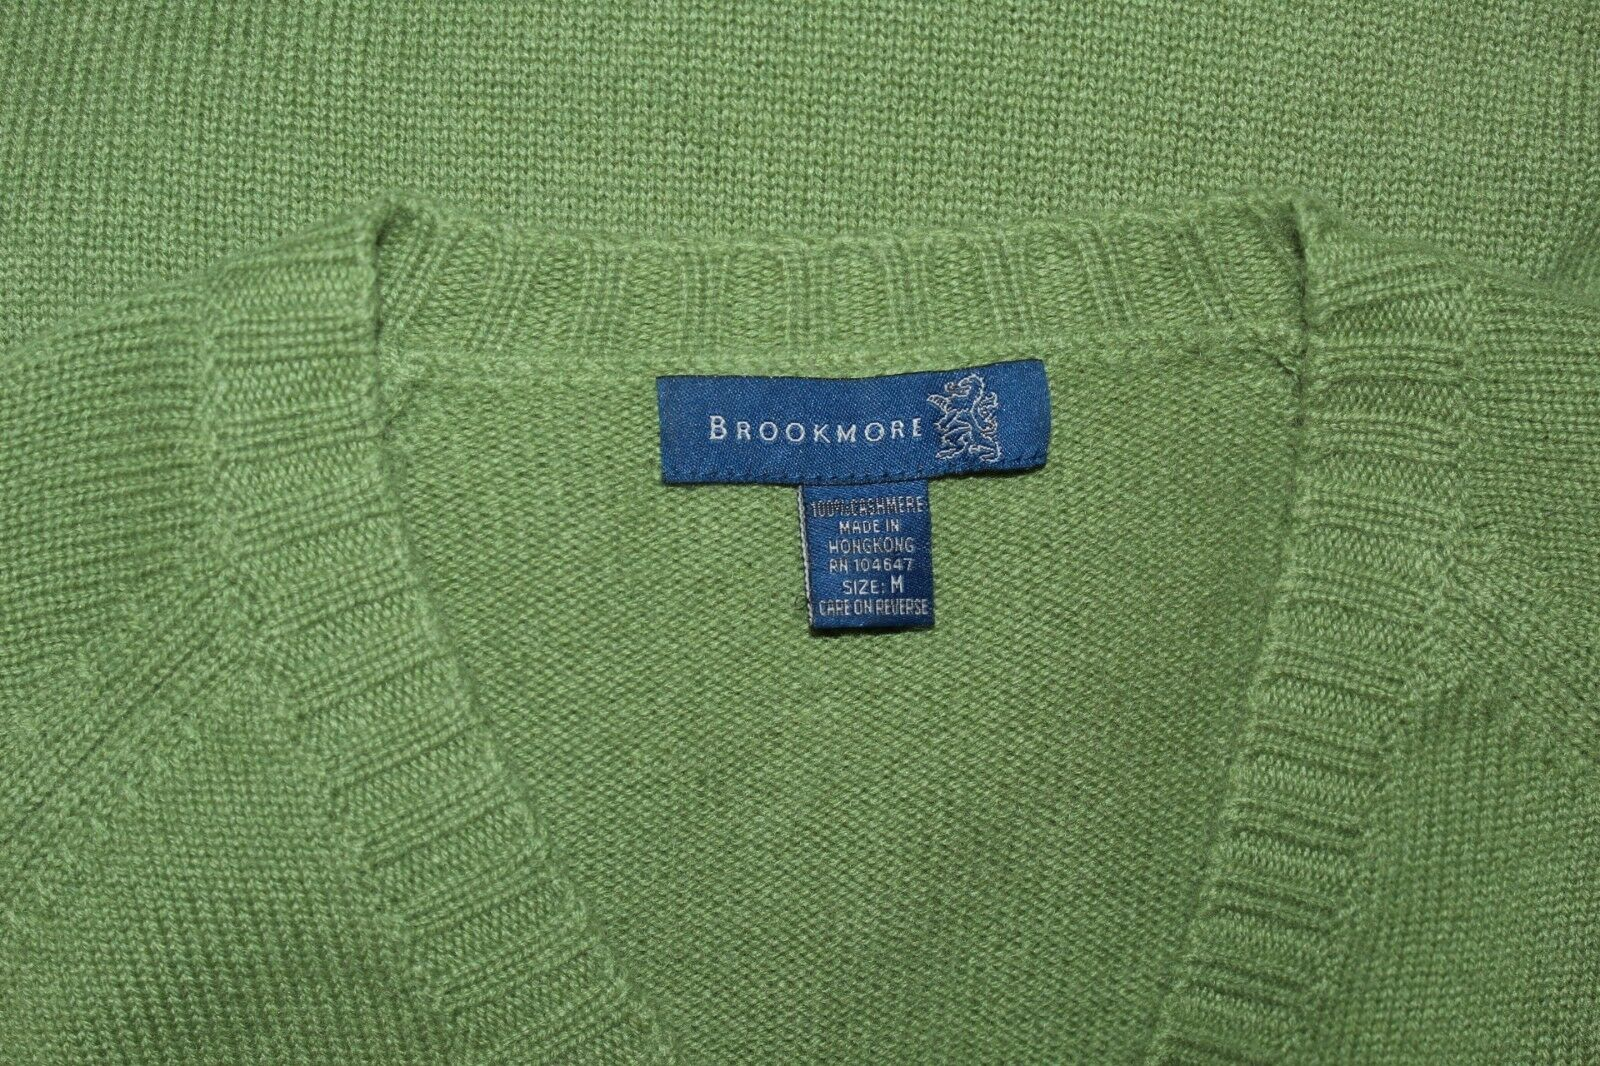 Karl Kani rosso Jeans Light rosso Kani Hooded Sweatshirt 2XL, XXL 5-23-68 9cd395